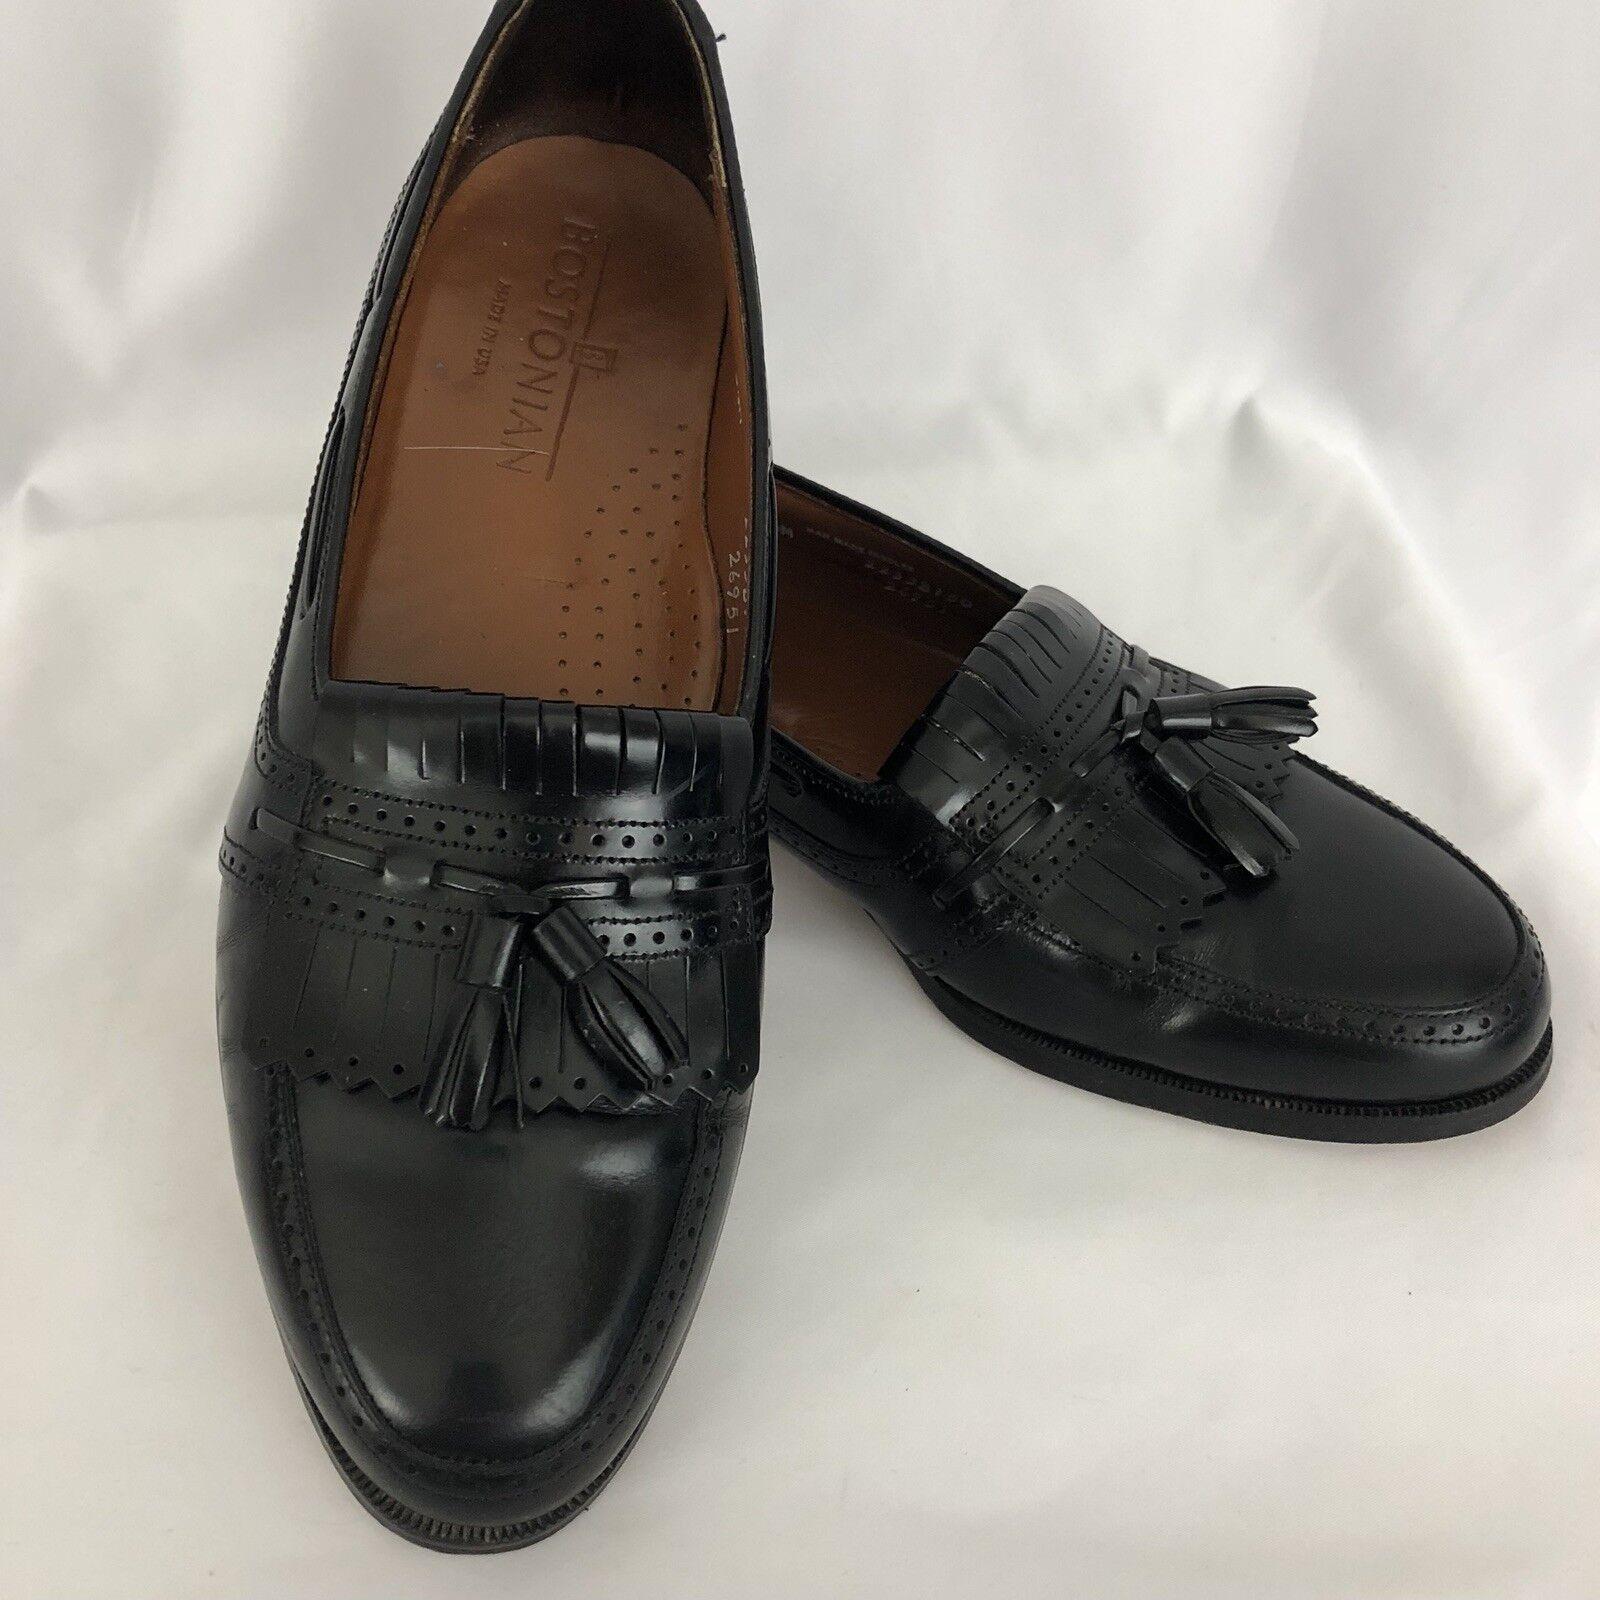 Bostonian Mens Classics Black Leather Dress Tassel Loafers shoes 8.5 M EUC SH266